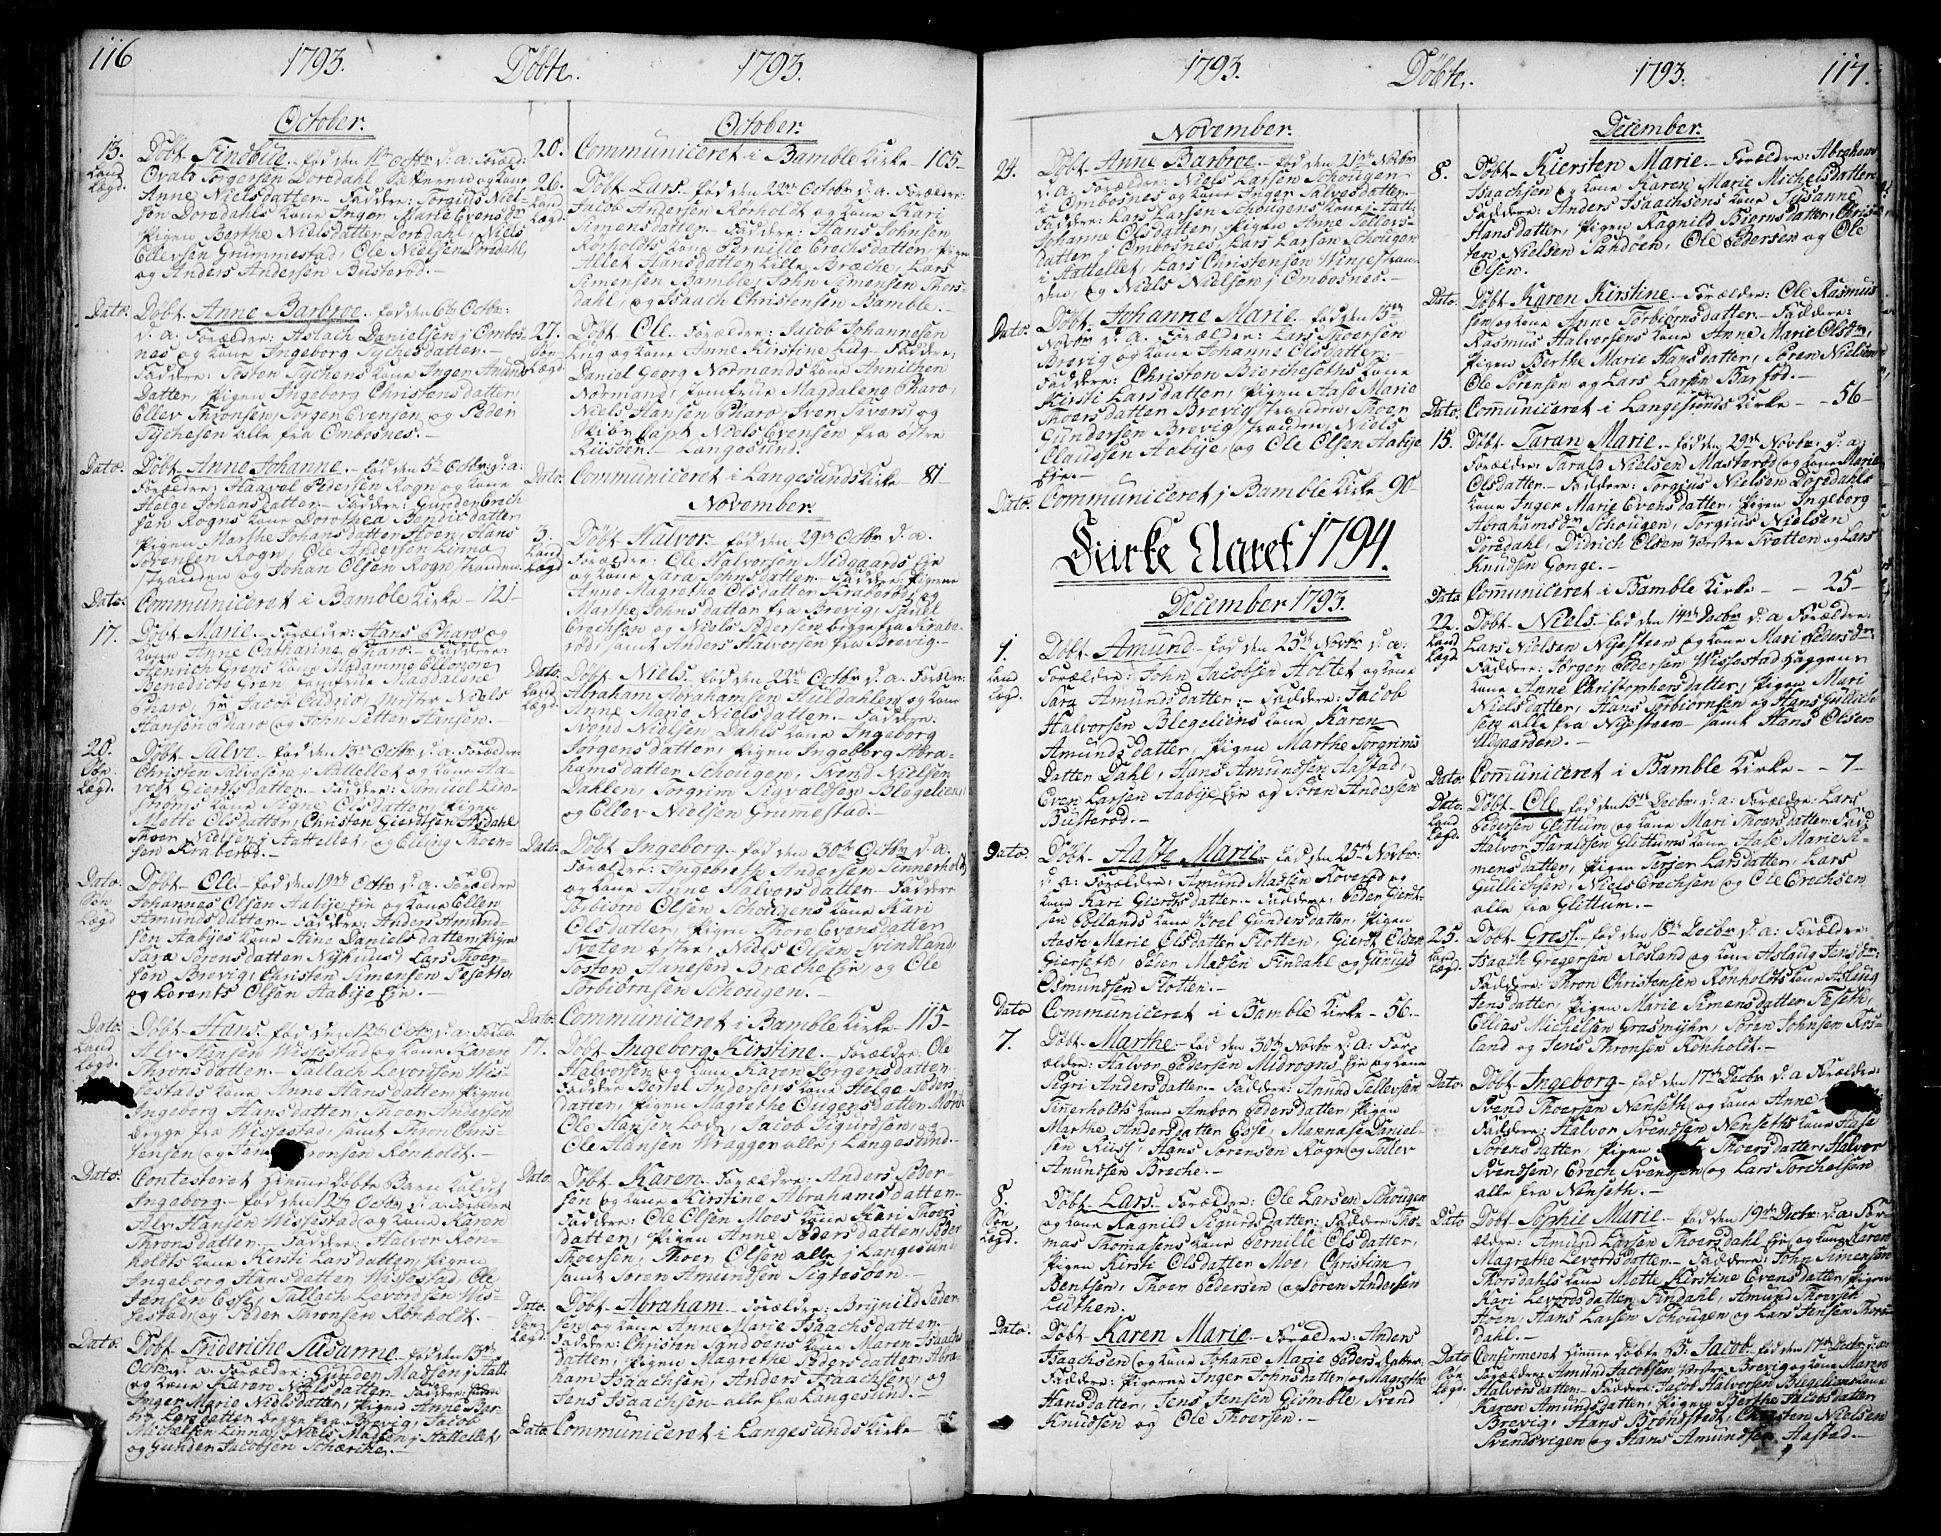 SAKO, Bamble kirkebøker, F/Fa/L0002: Ministerialbok nr. I 2, 1775-1814, s. 116-117